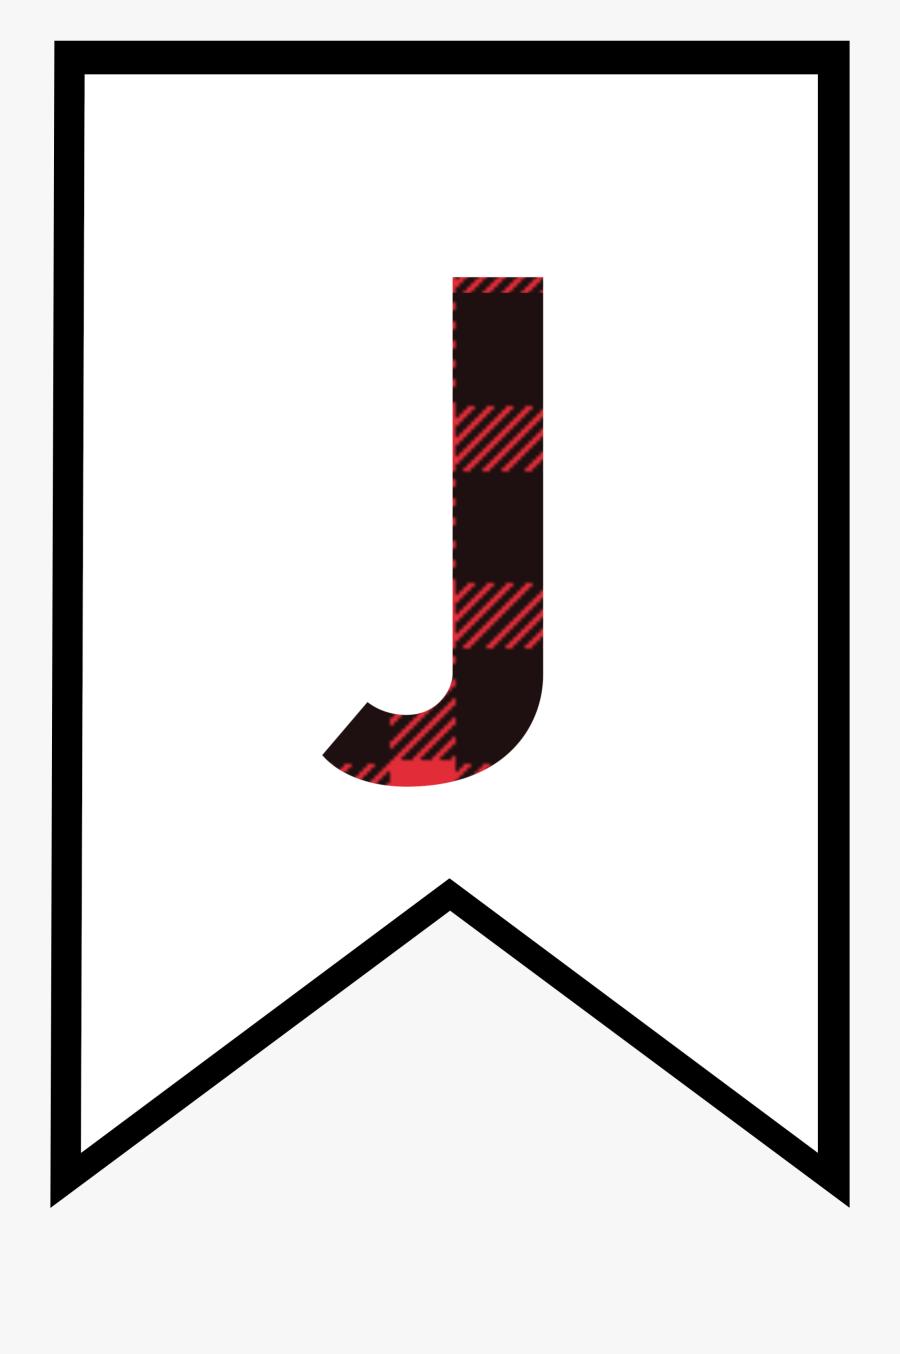 J Buffalo Plaid Banner Letter.